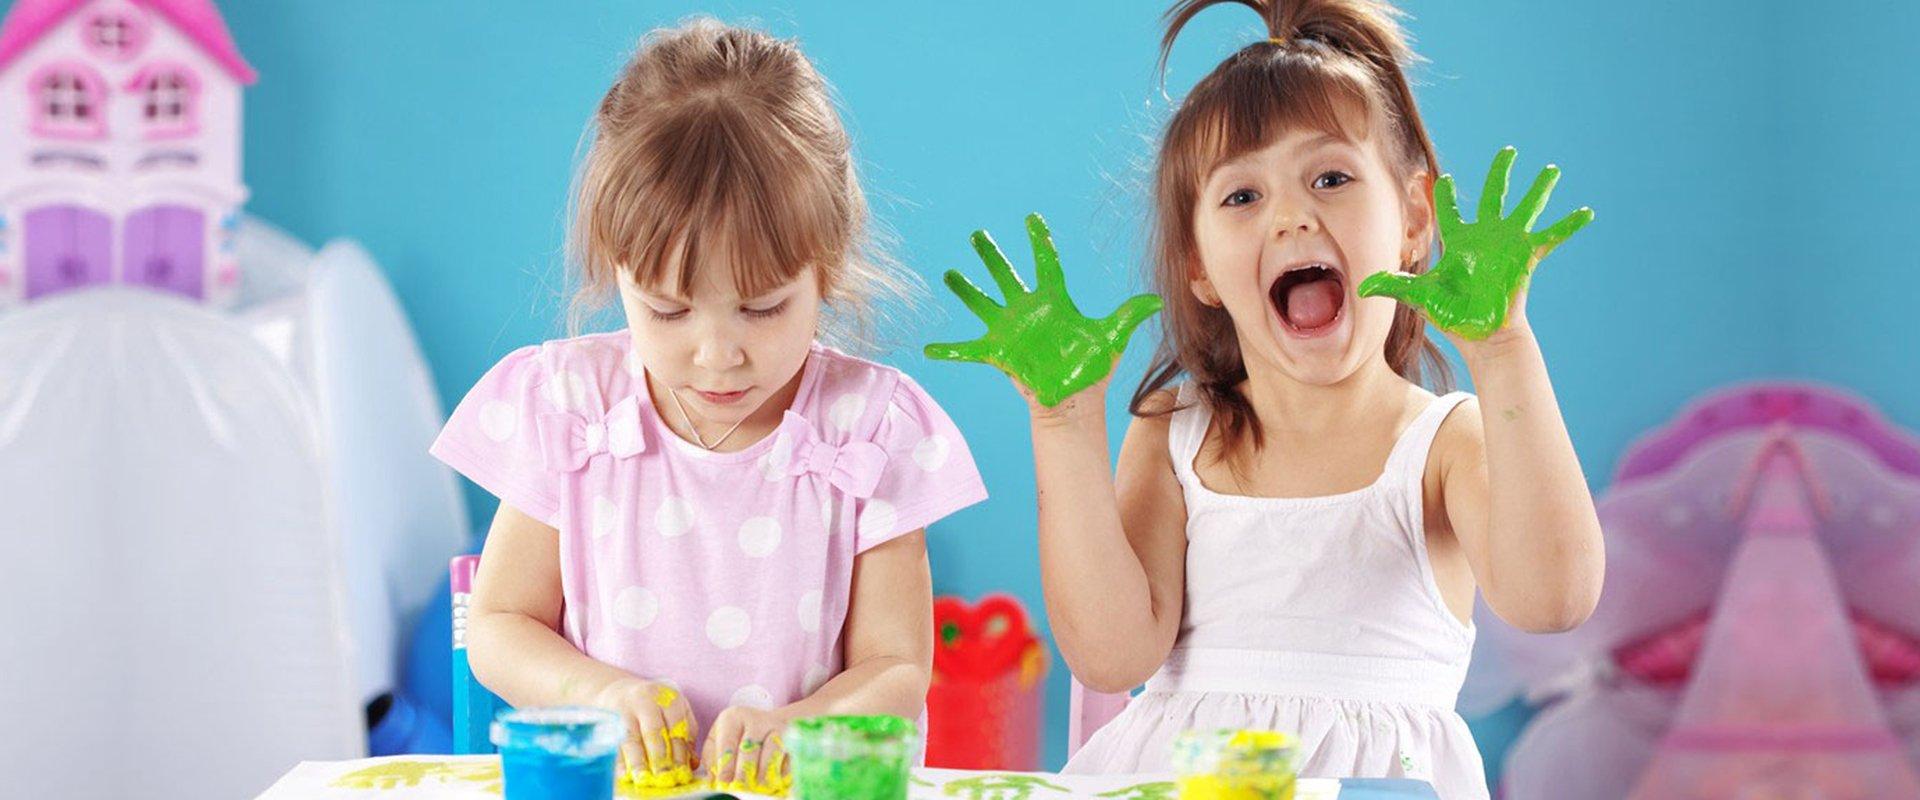 Nursery children painting